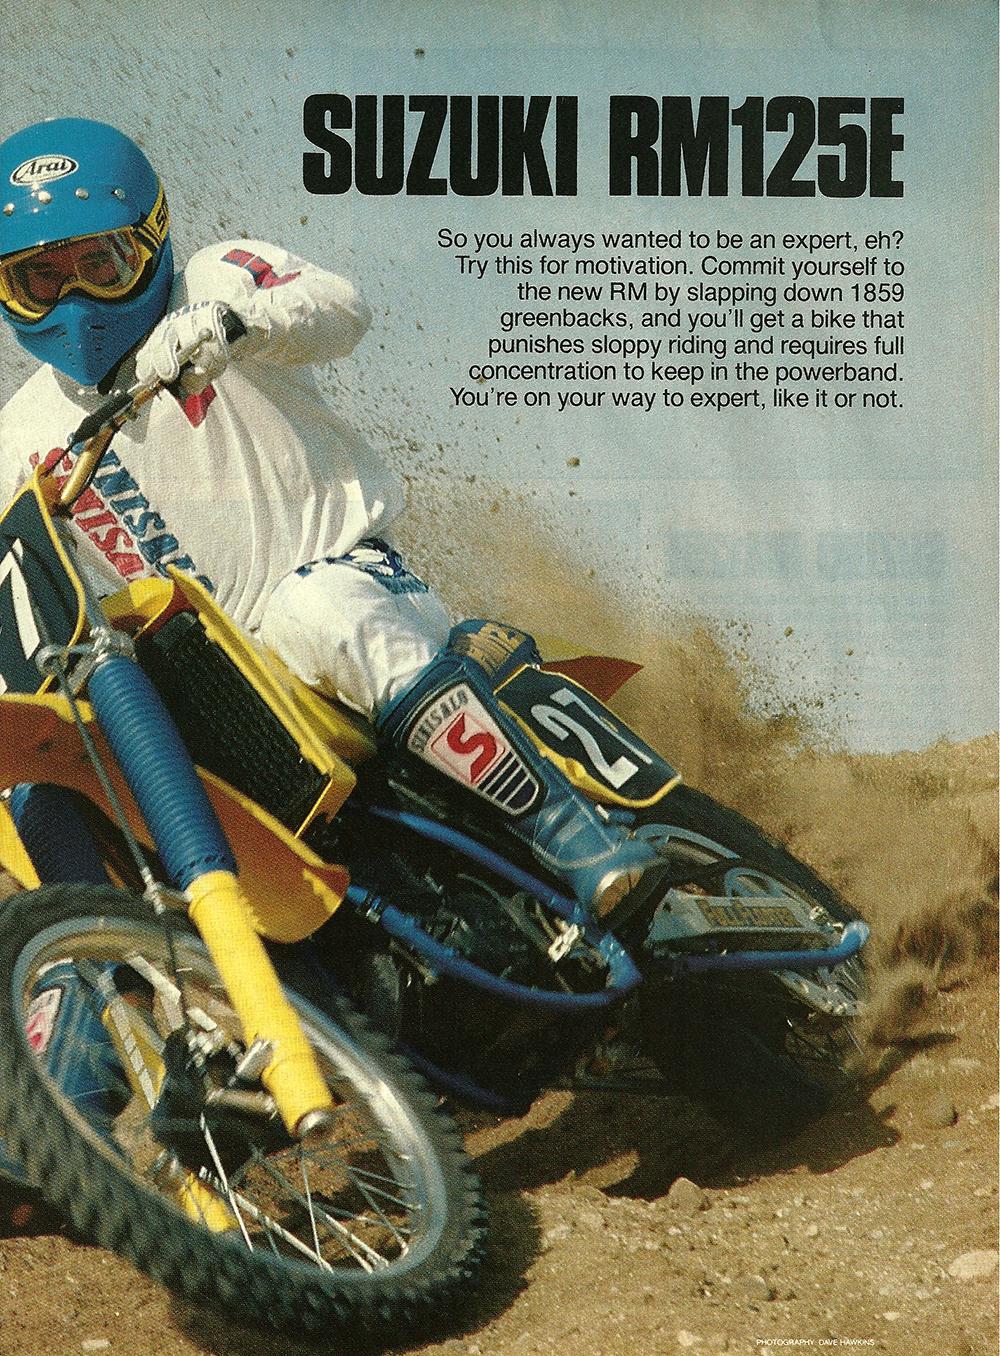 1984 Suzuki RM125E road test 2.jpg